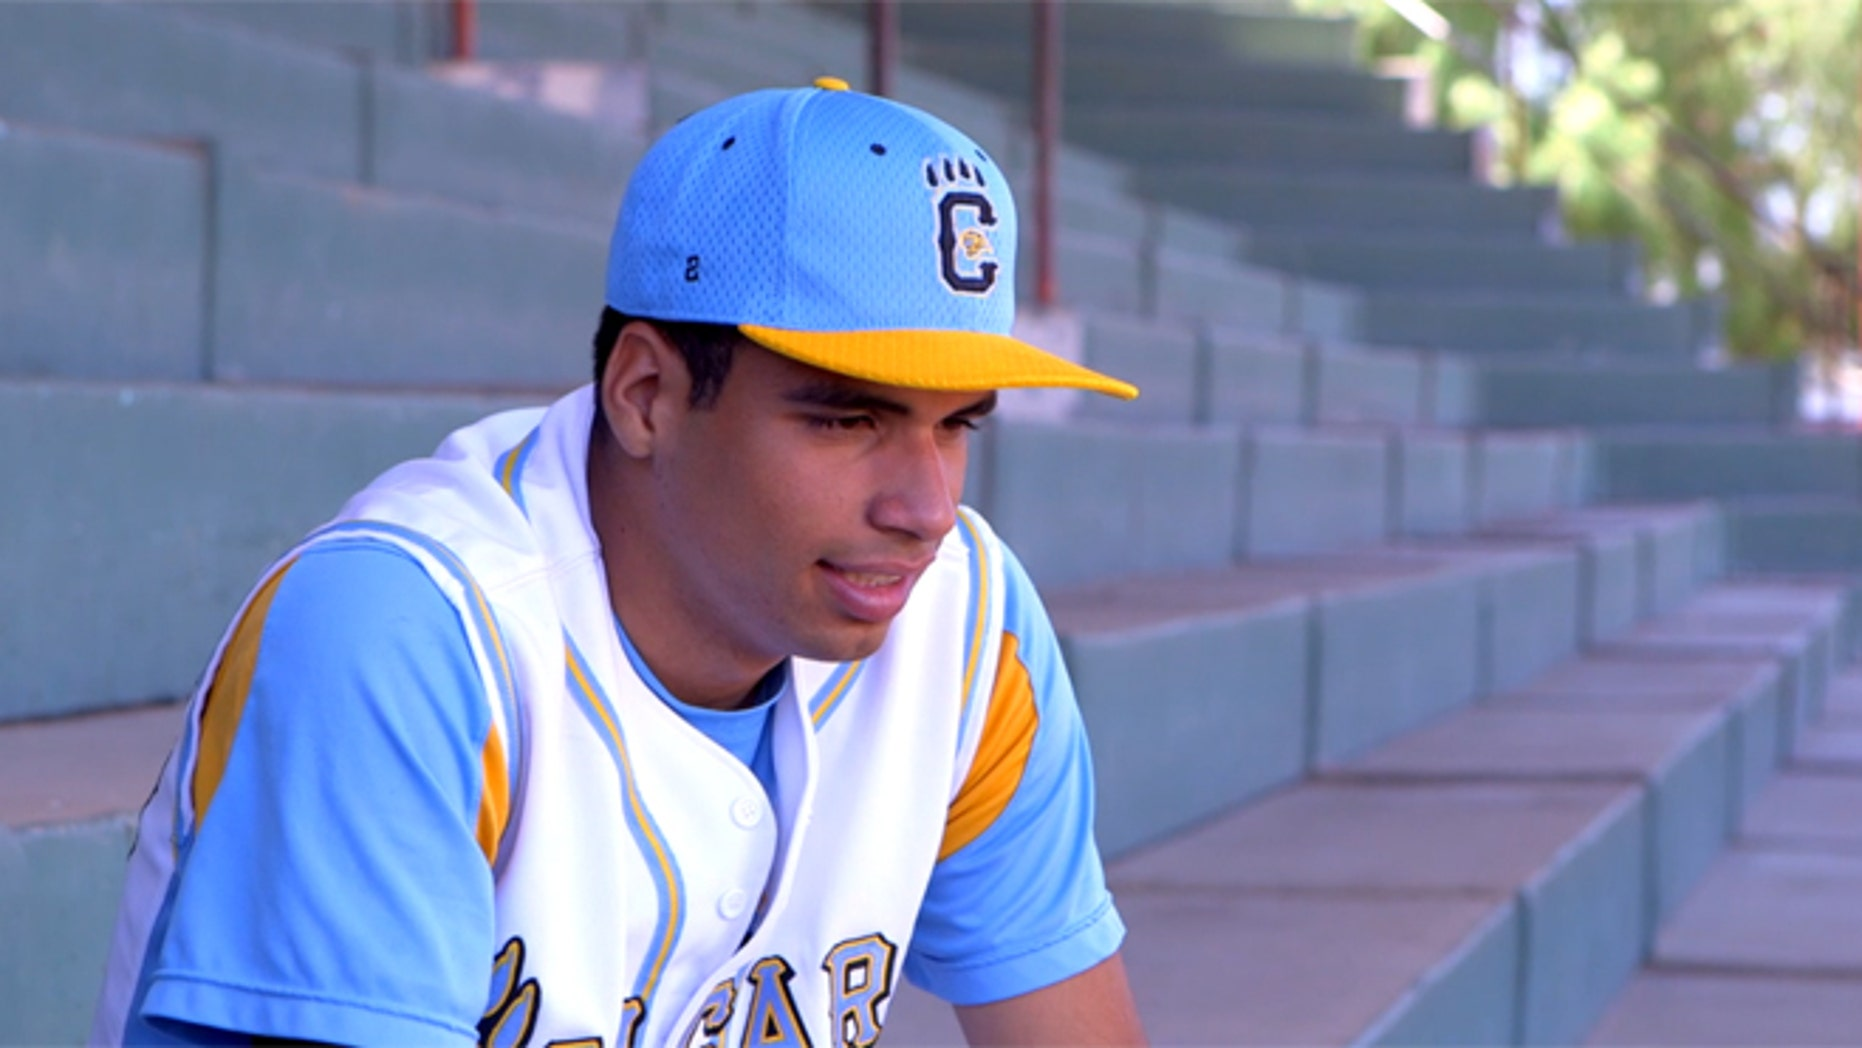 Octavio Arroyo in Tijuana, Mexico, still wearing his San Ysidro High uniform. (Source: Screen shot from ESPN)